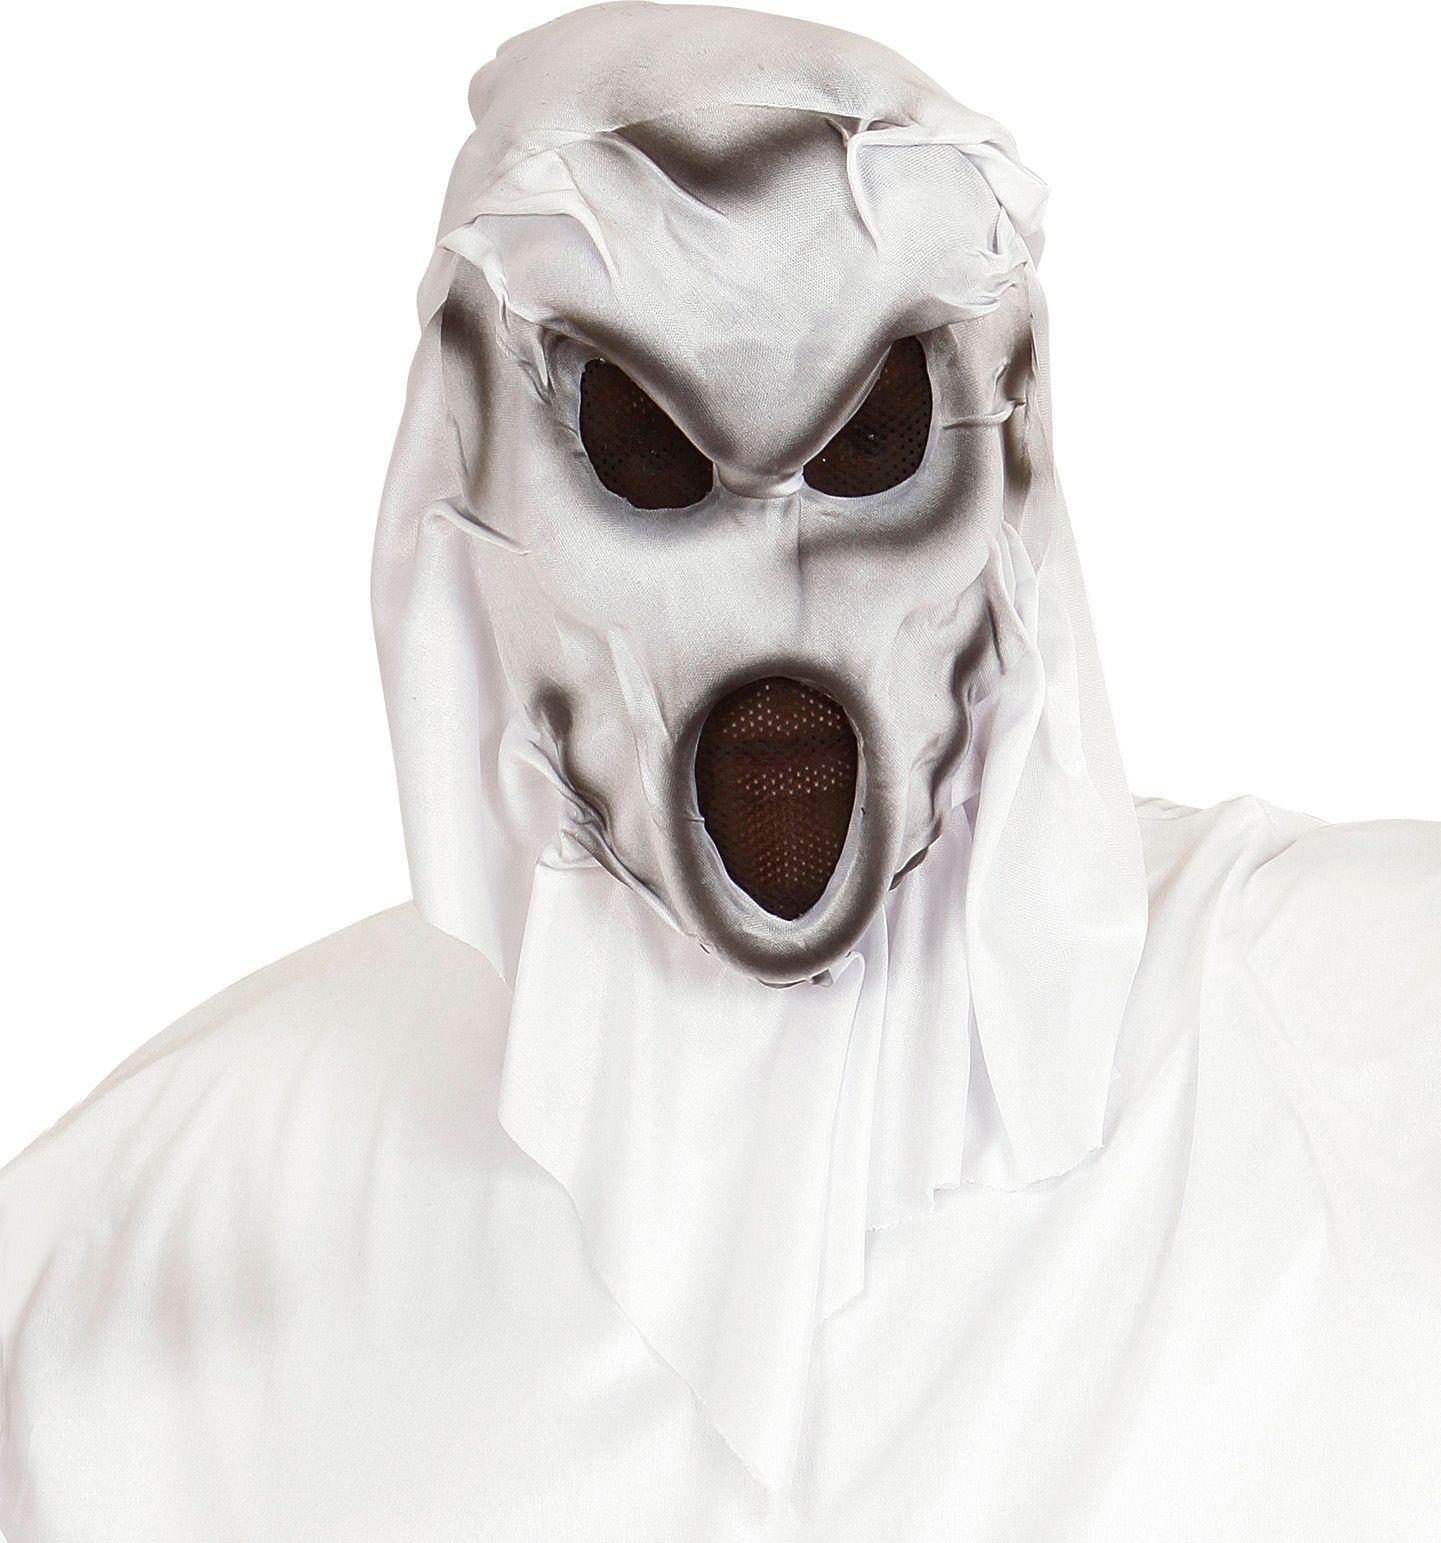 Geest masker